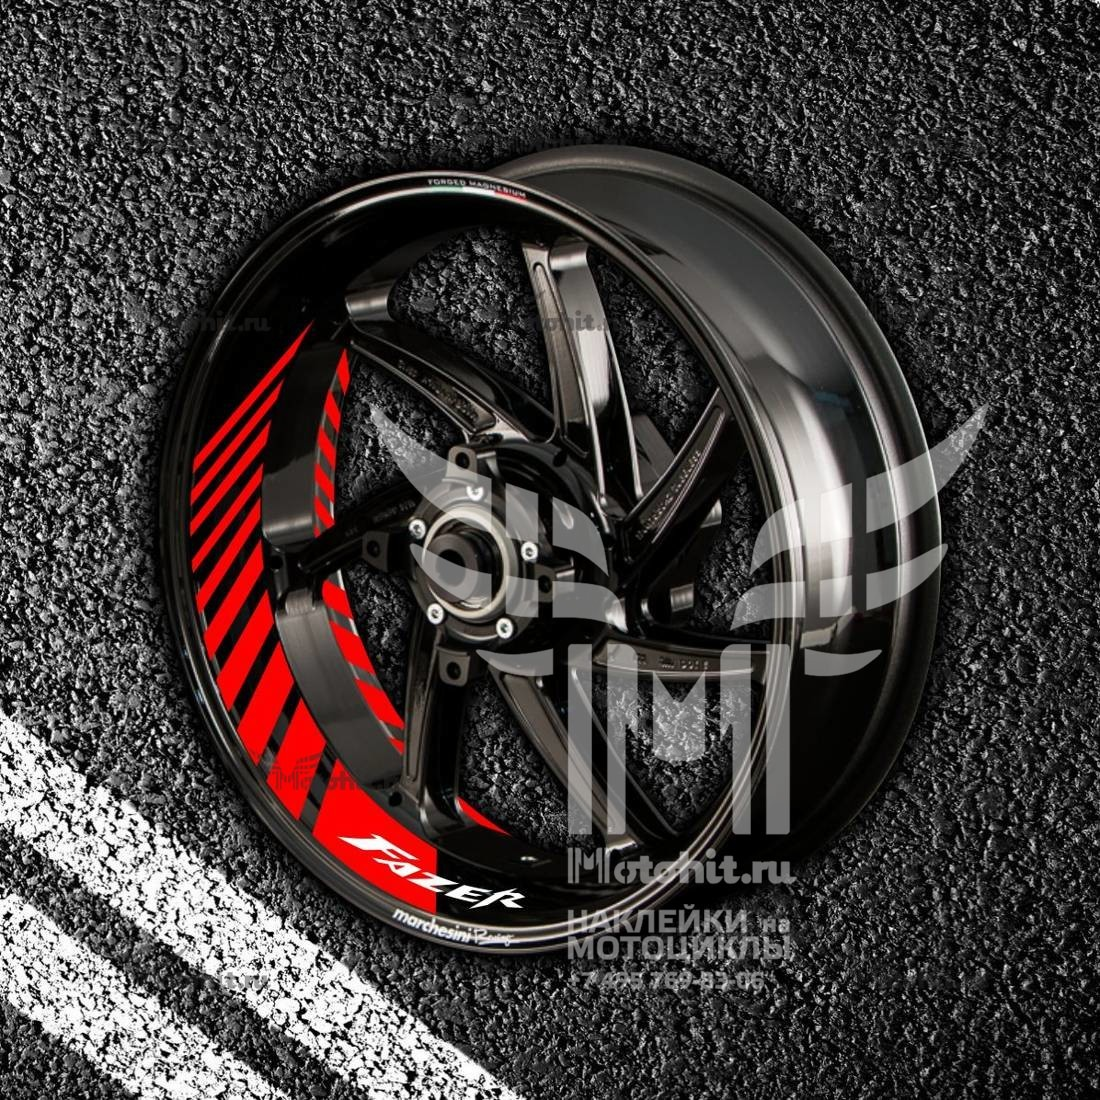 Комплект наклеек с полосами на колеса мотоцикла YAMAHA FAZER